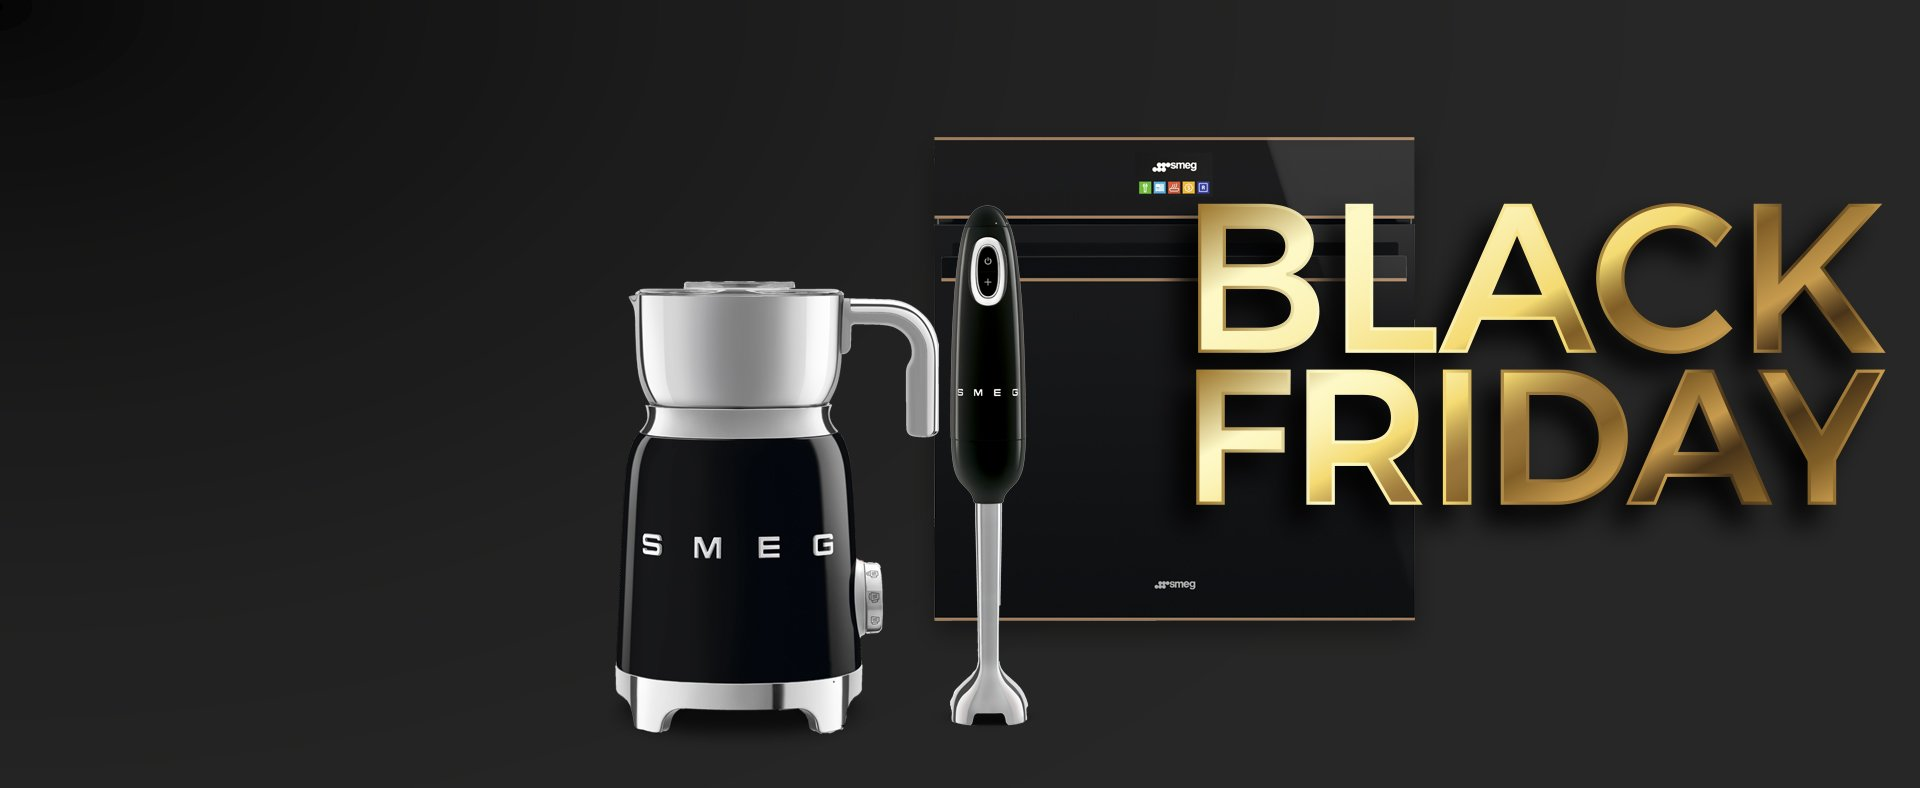 Black Friday Smeg | Tienda oficial Smeg